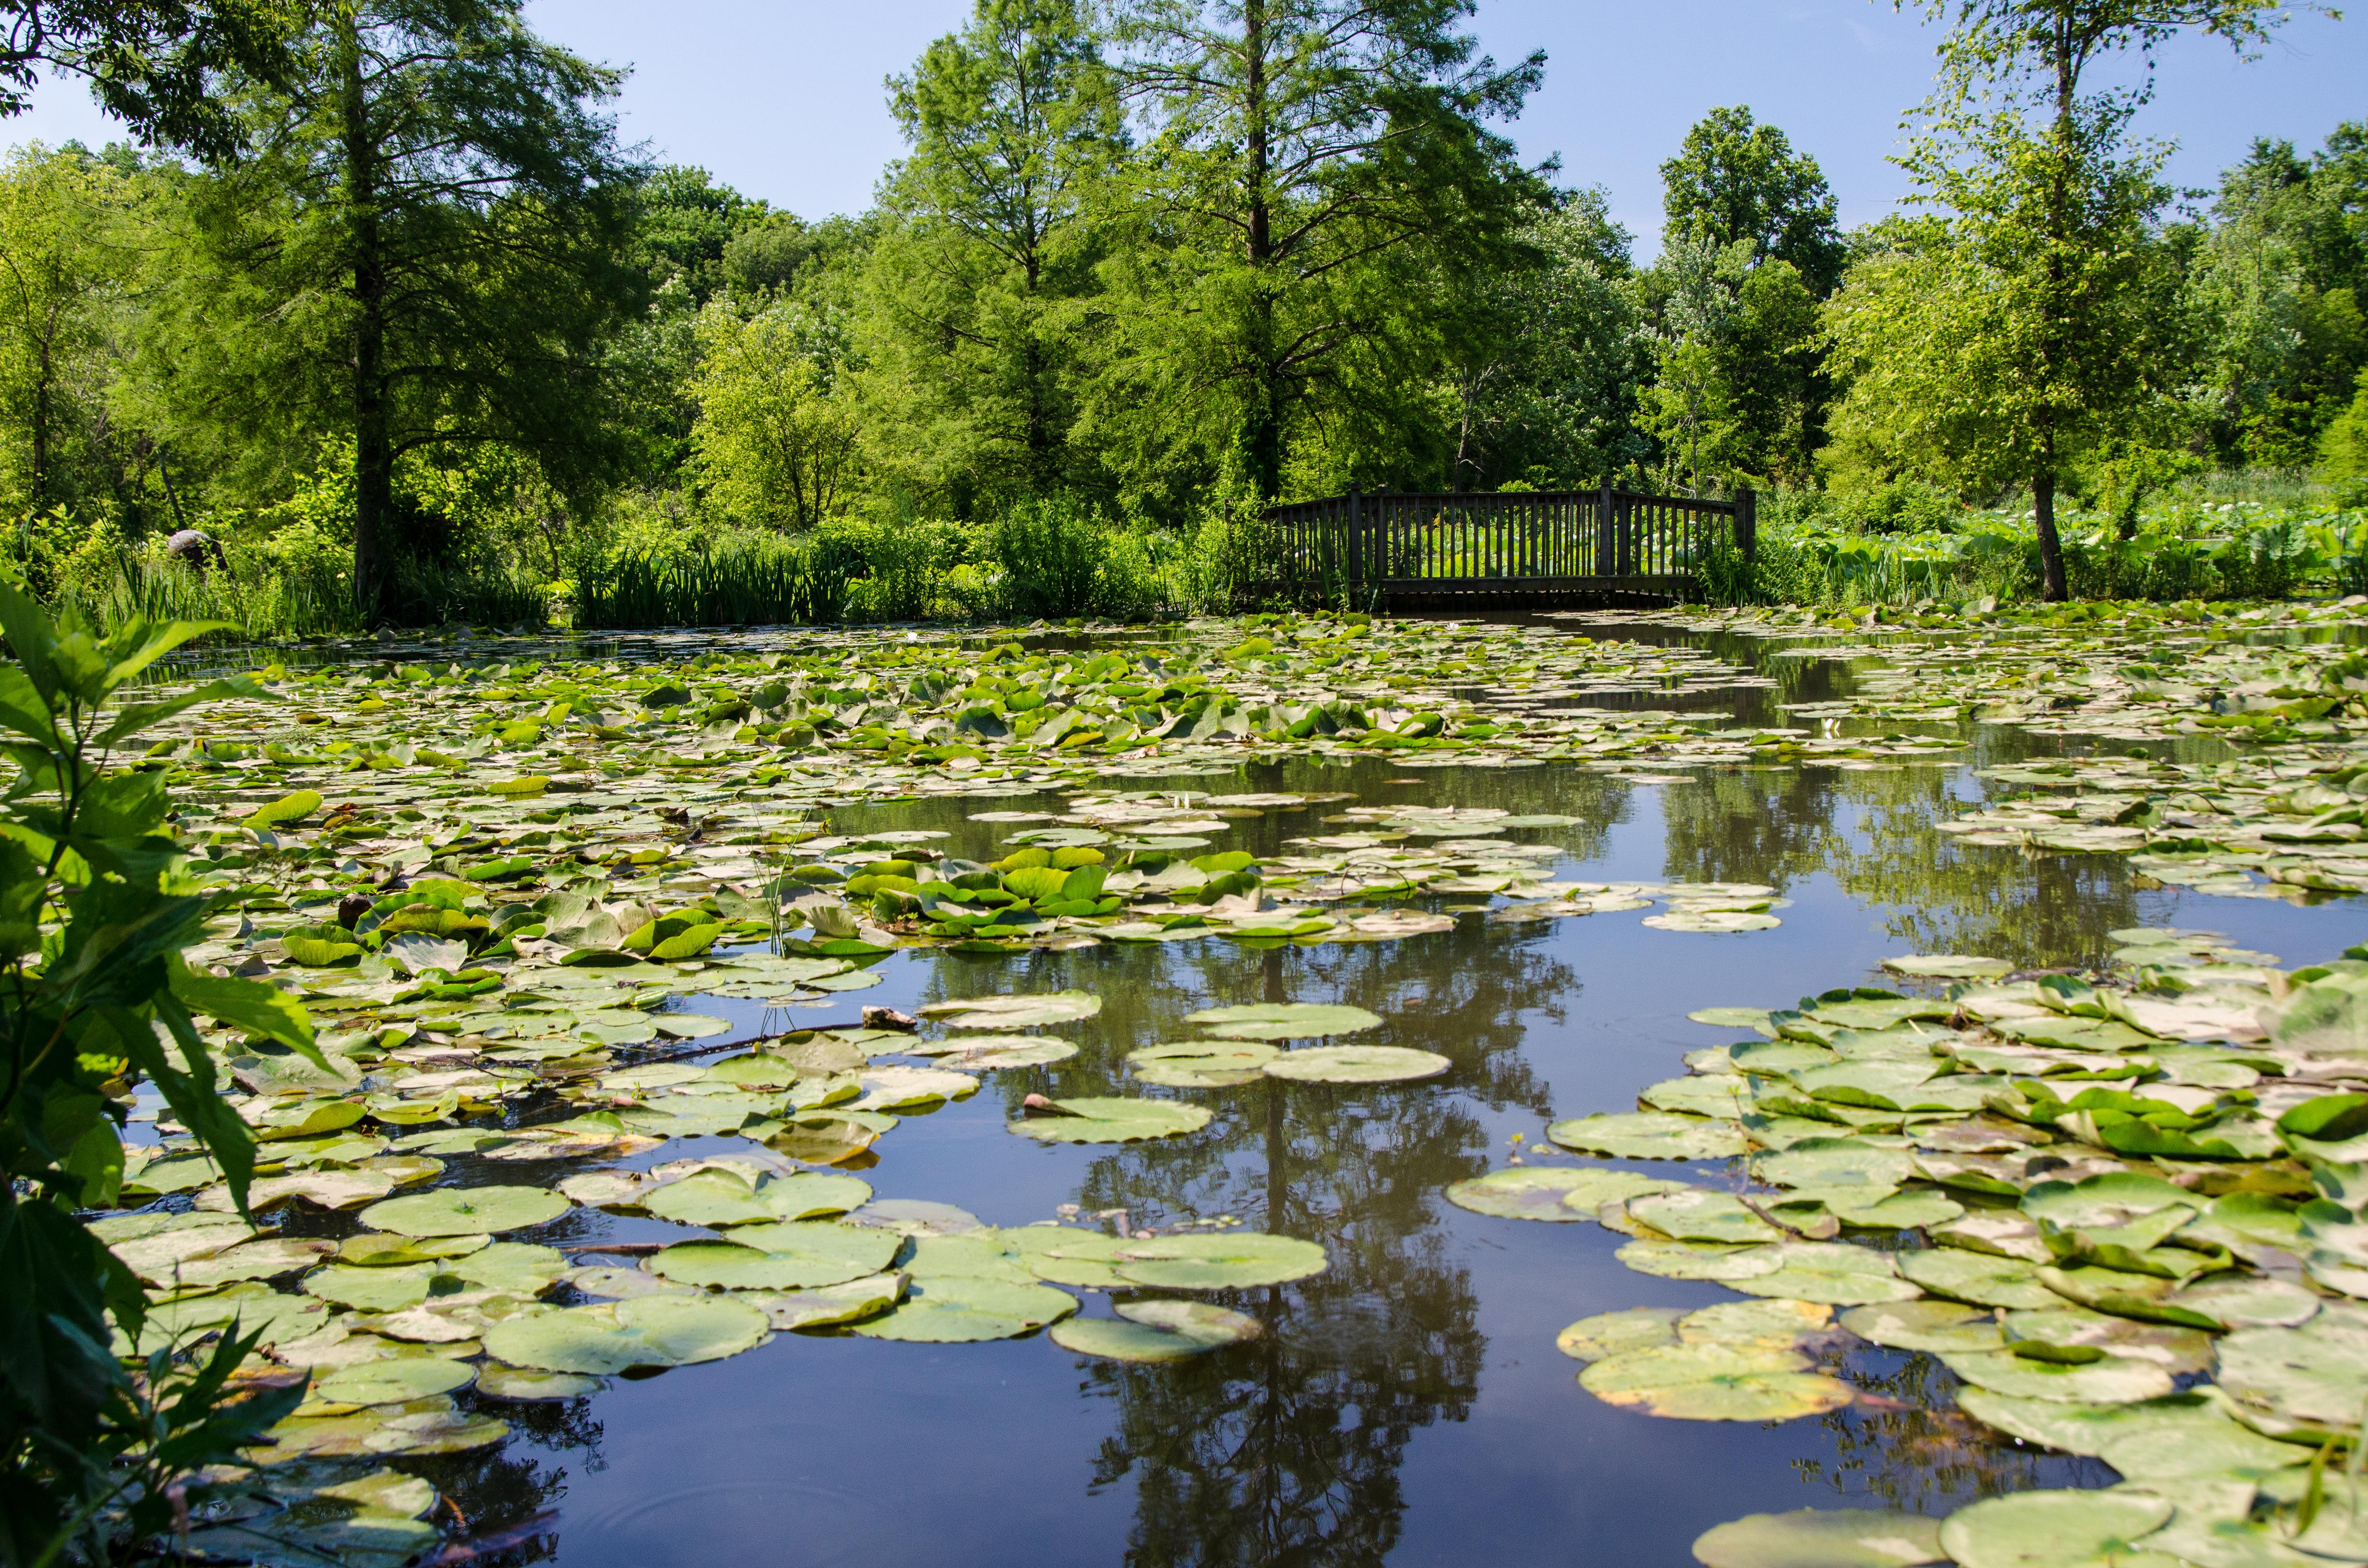 Water Lilies in Washington Kenilworth Aquatic Gardens